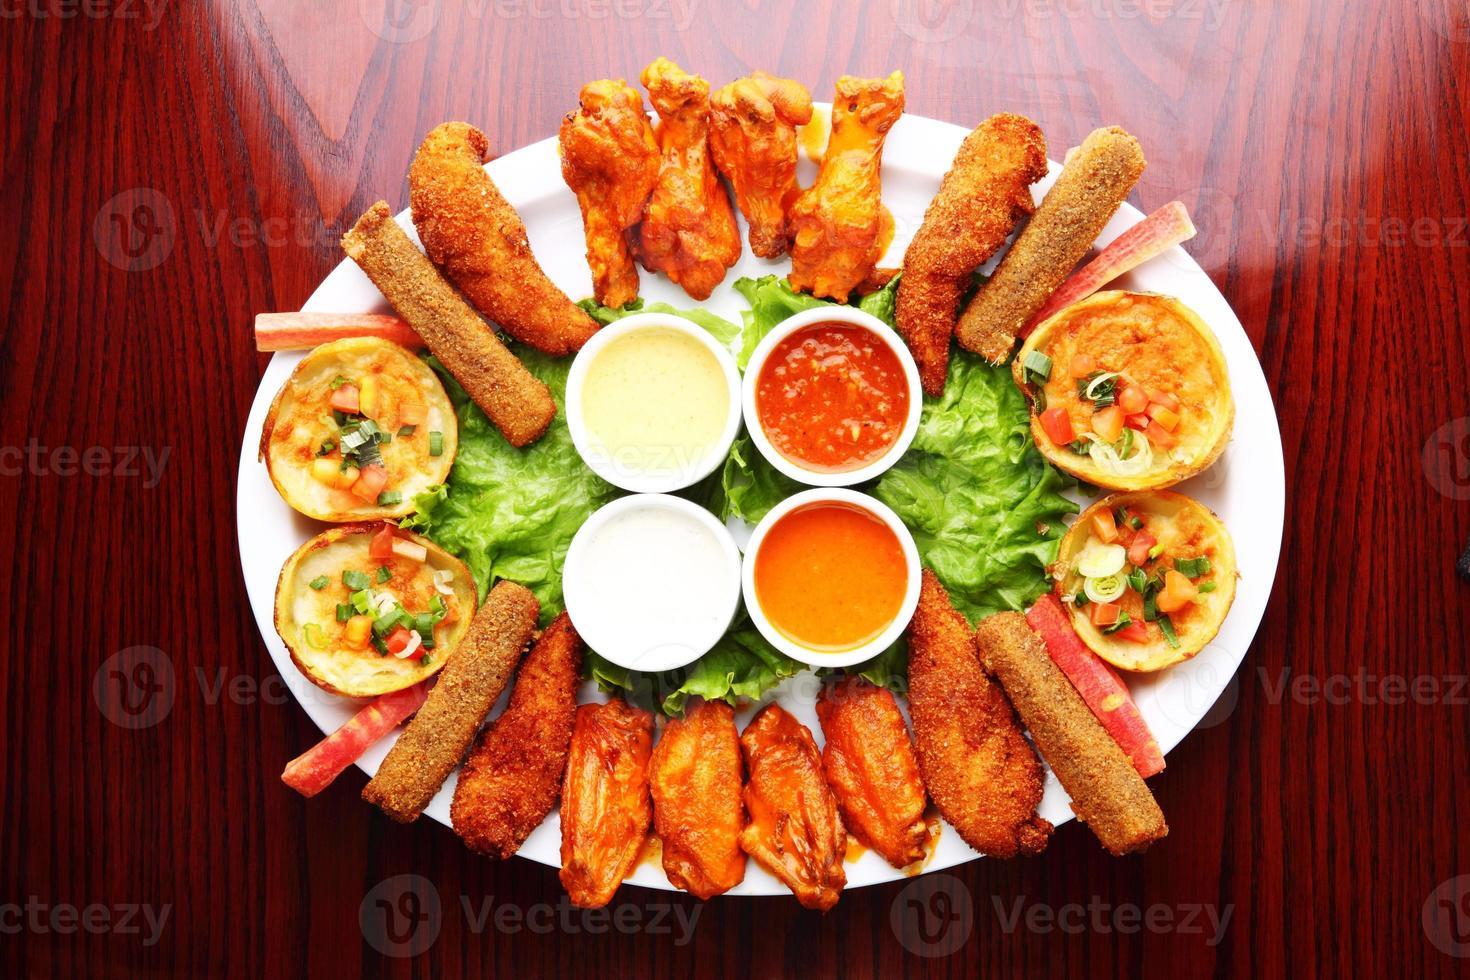 plato de aperitivo alitas de pollo a la brasa, pieles de patata foto